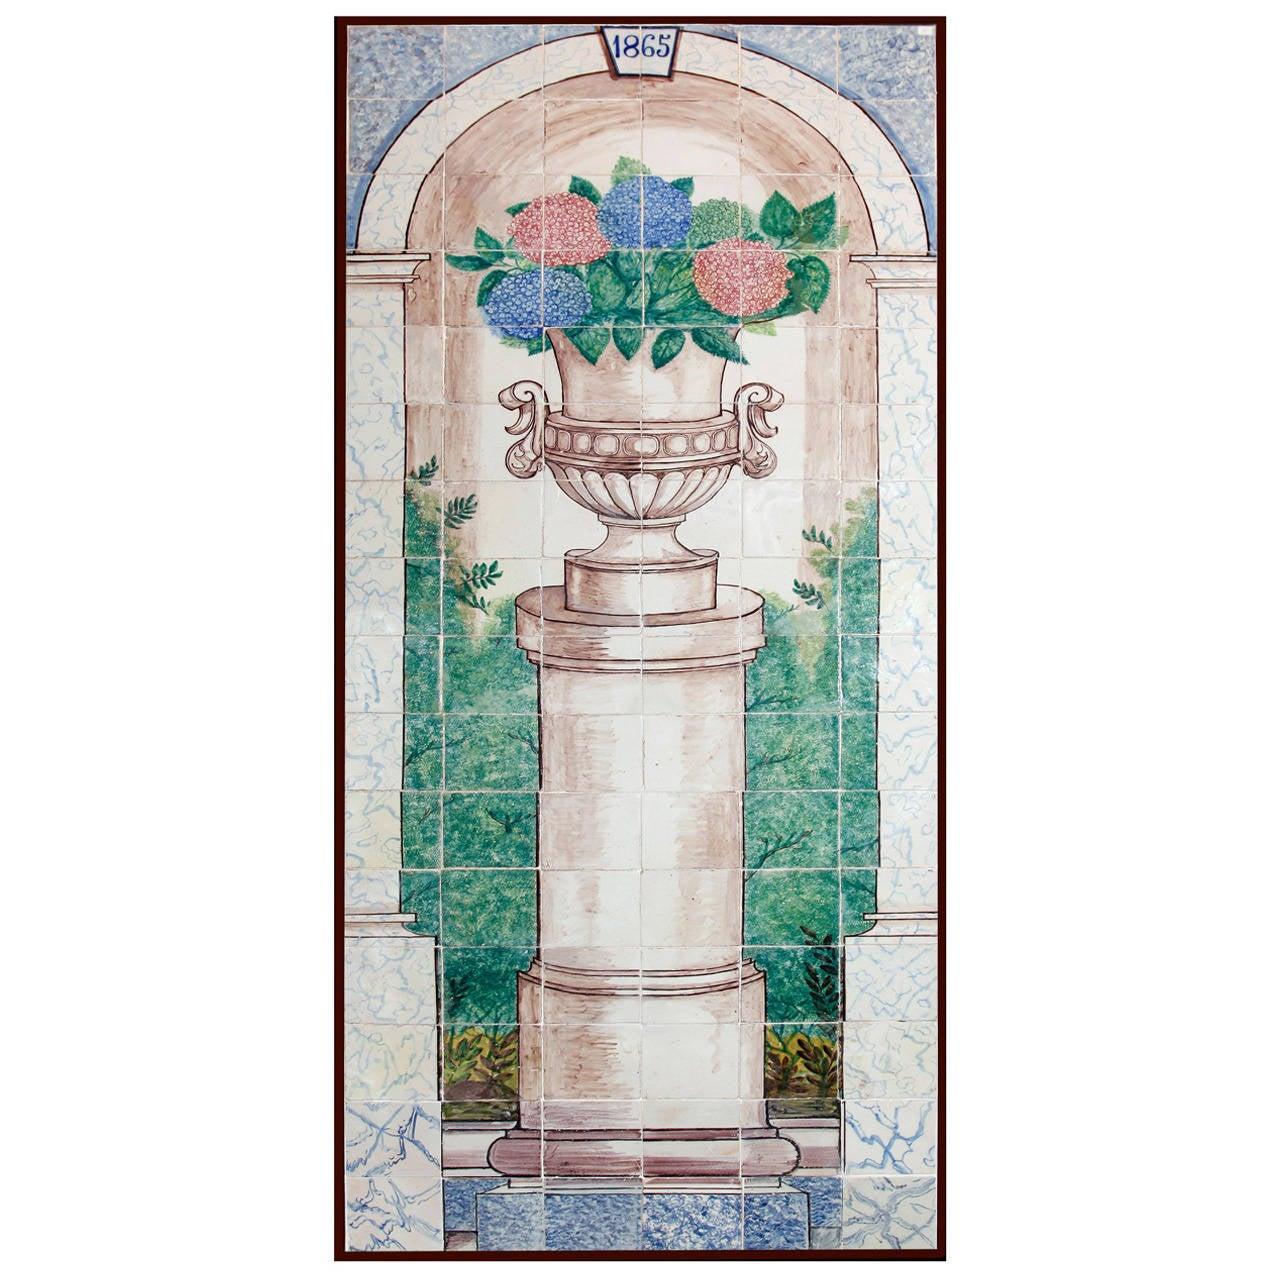 19th century portuguese tile mural for sale at 1stdibs. Black Bedroom Furniture Sets. Home Design Ideas